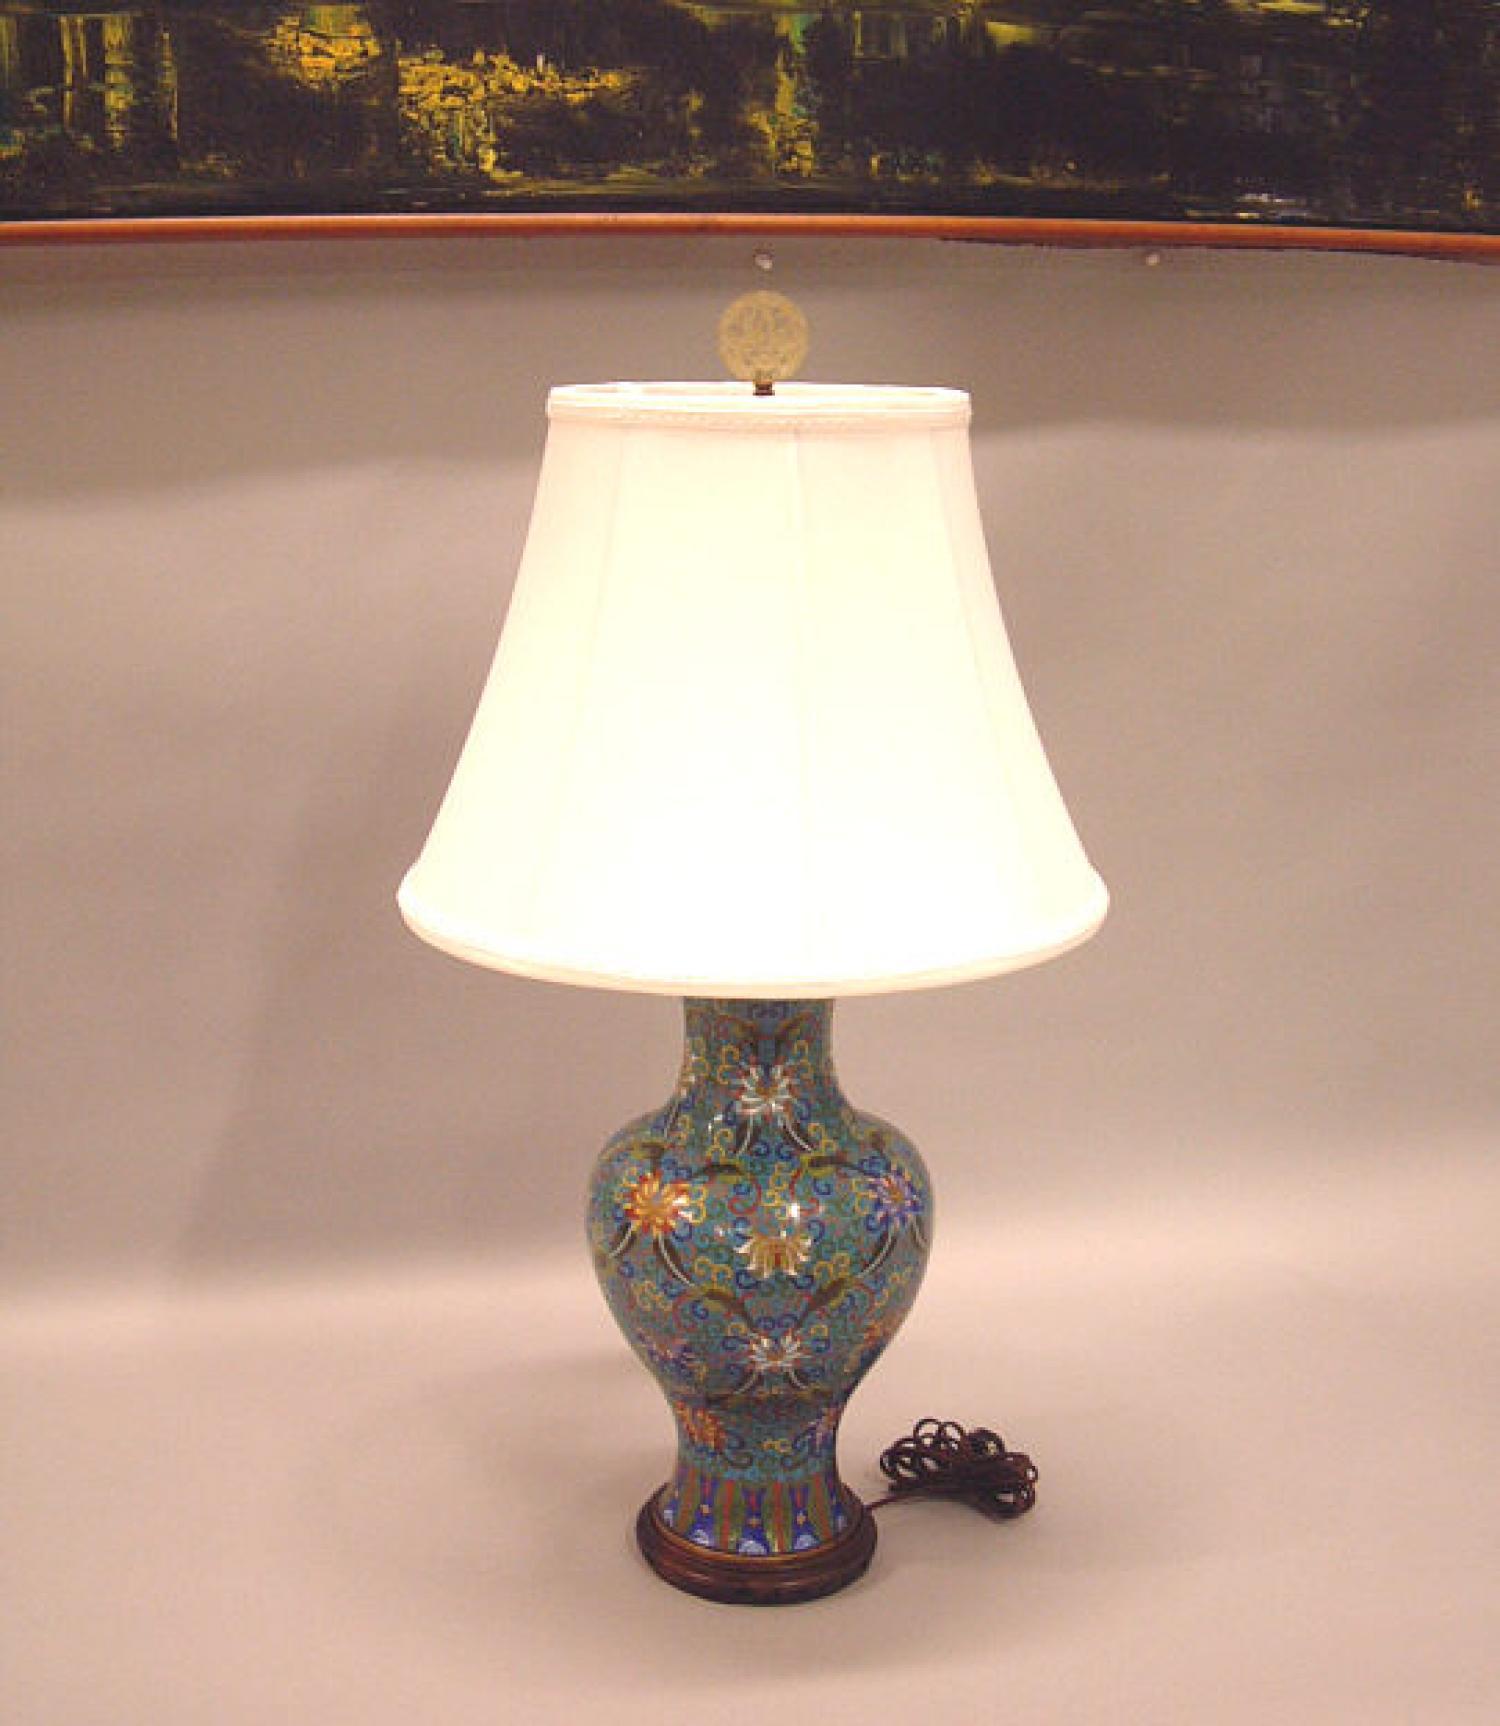 Antique Chinese Cloisonne vase lamp